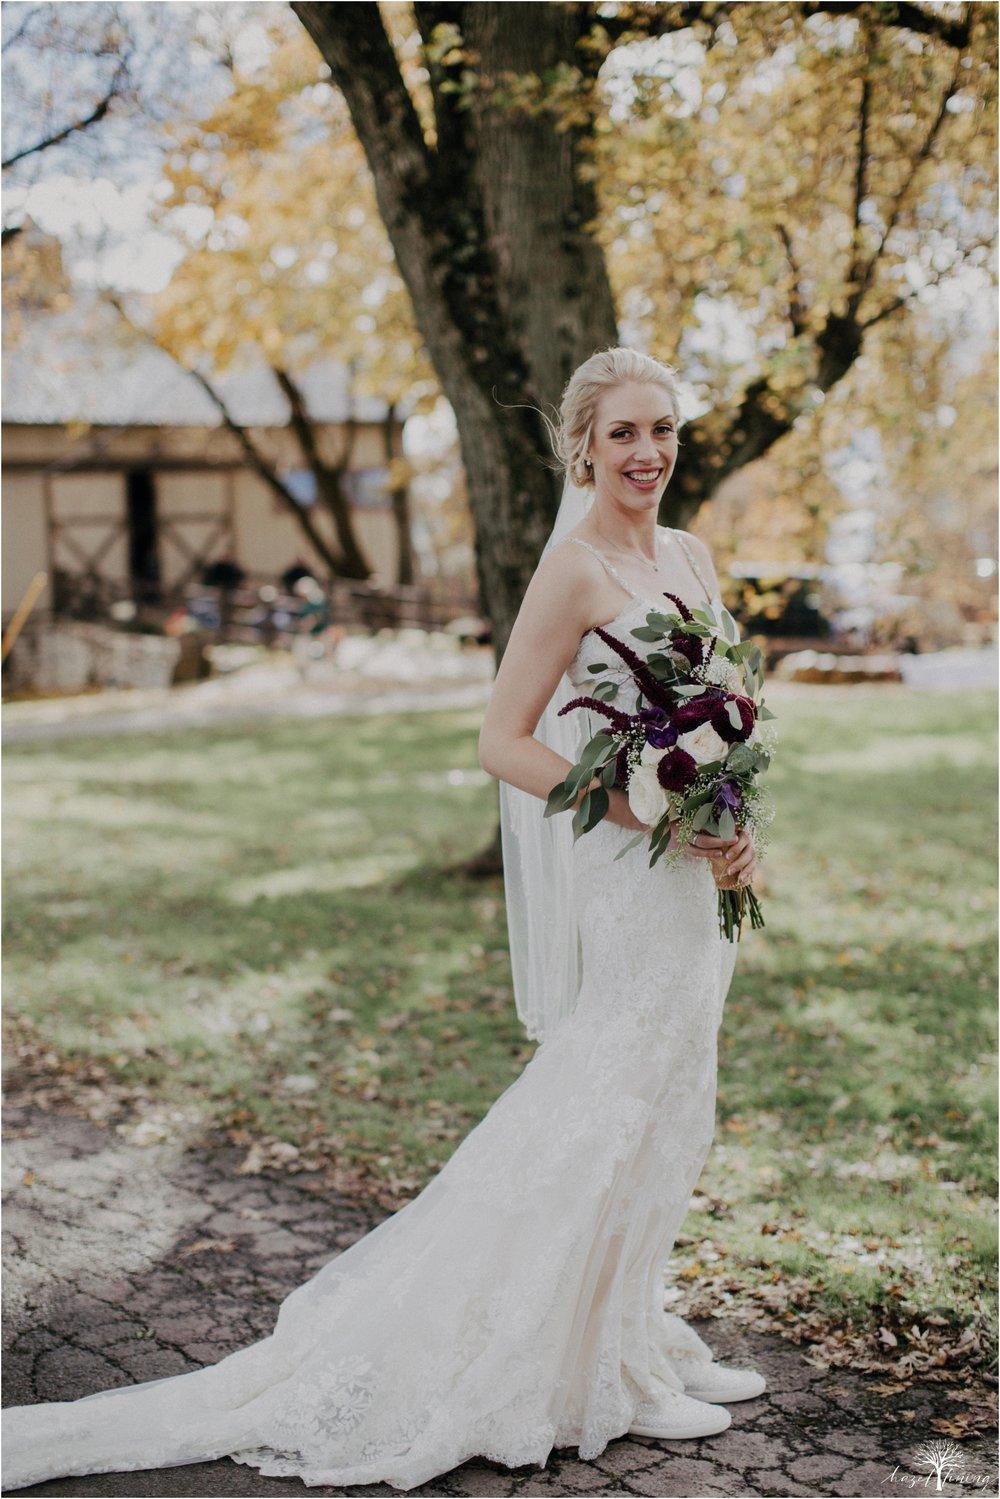 briana-krans-greg-johnston-farm-bakery-and-events-fall-wedding_0037.jpg